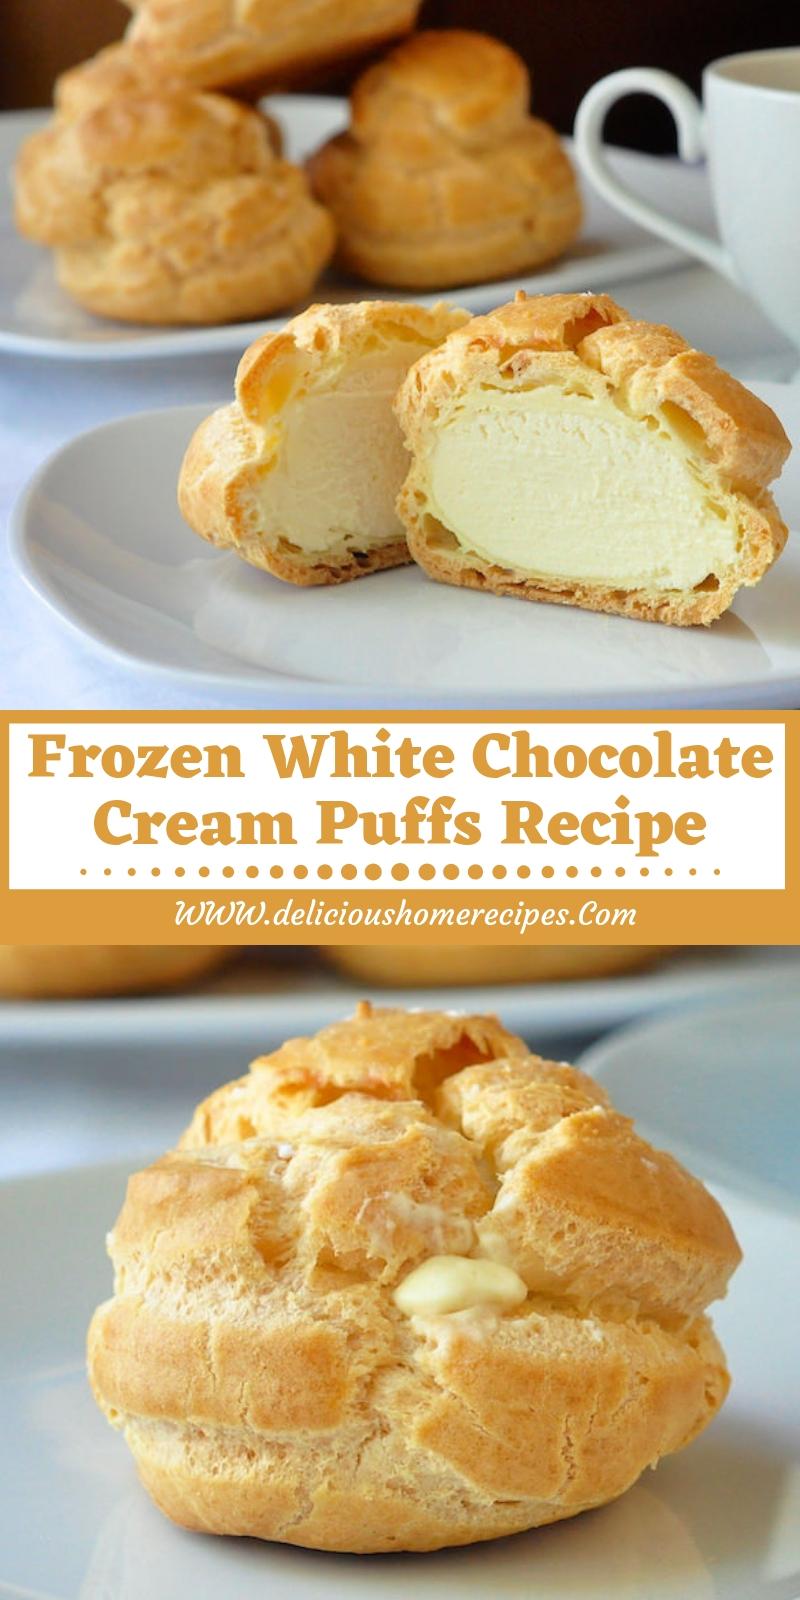 Frozen White Chocolate Cream Puffs Recipe